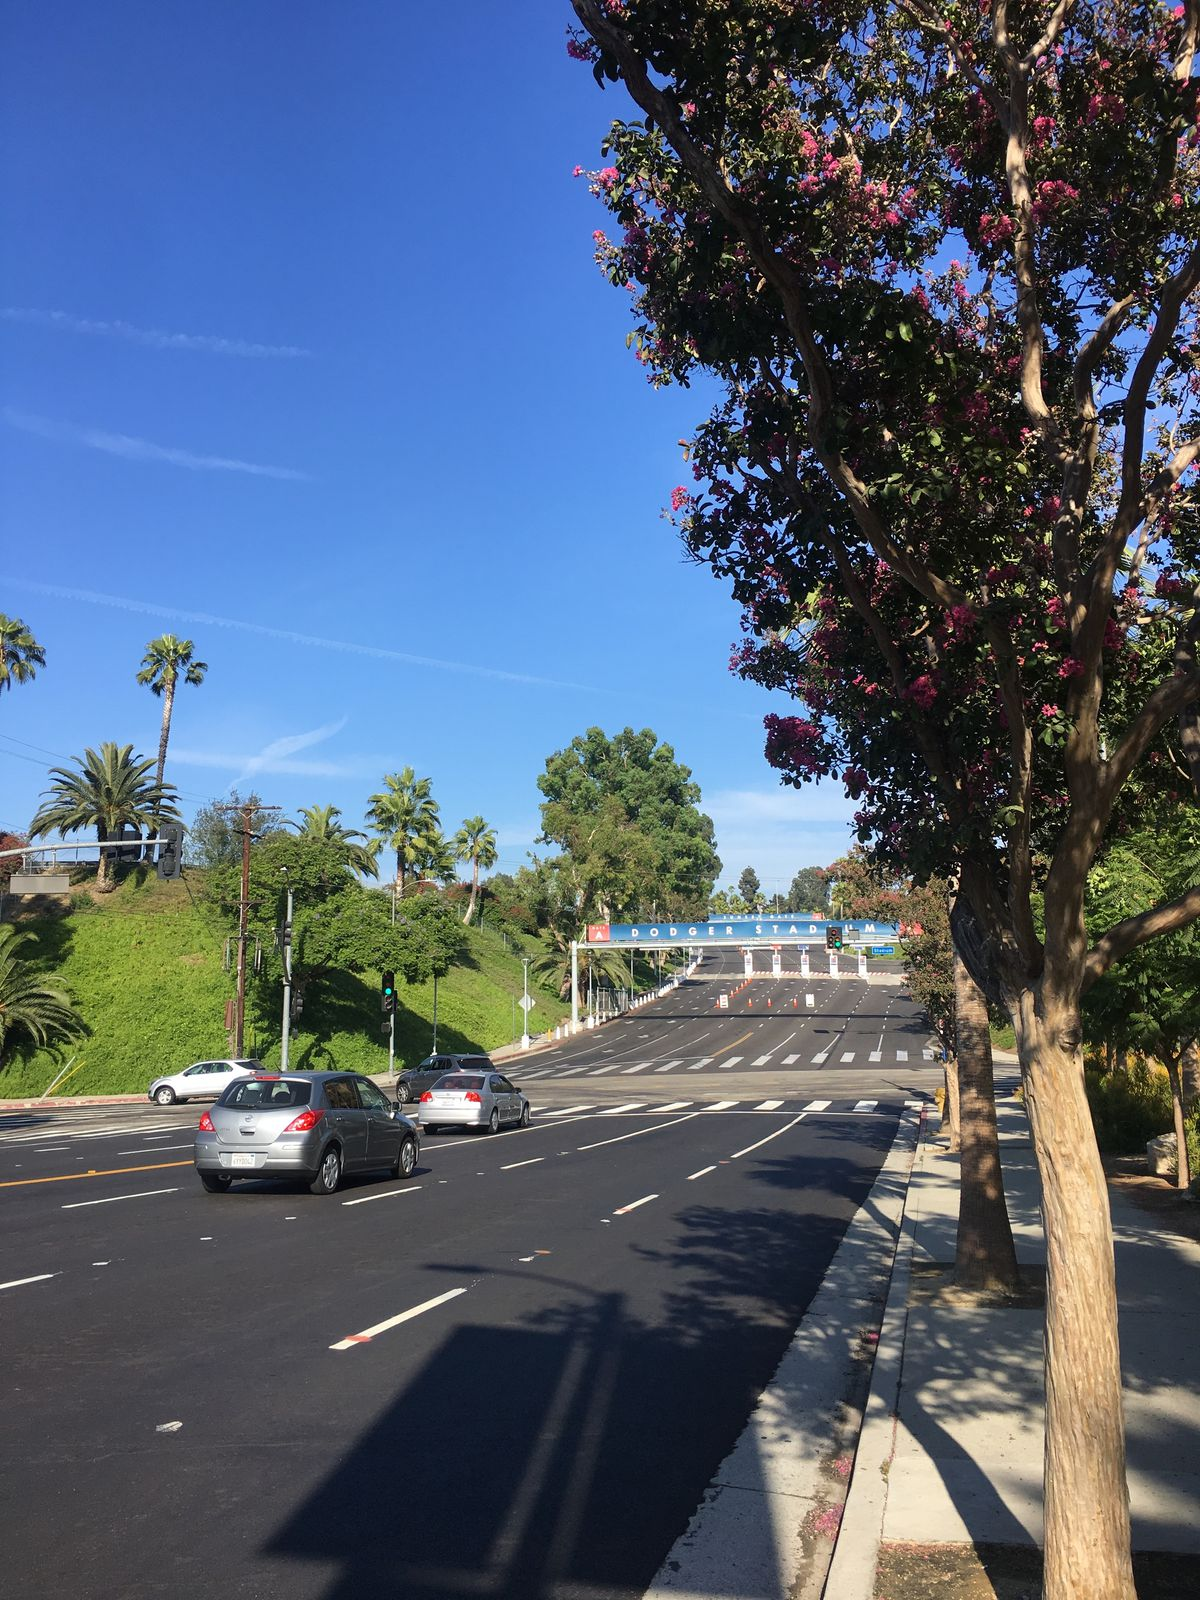 Dodger Stadium: Tips for seating, food, parking - Curbed LA